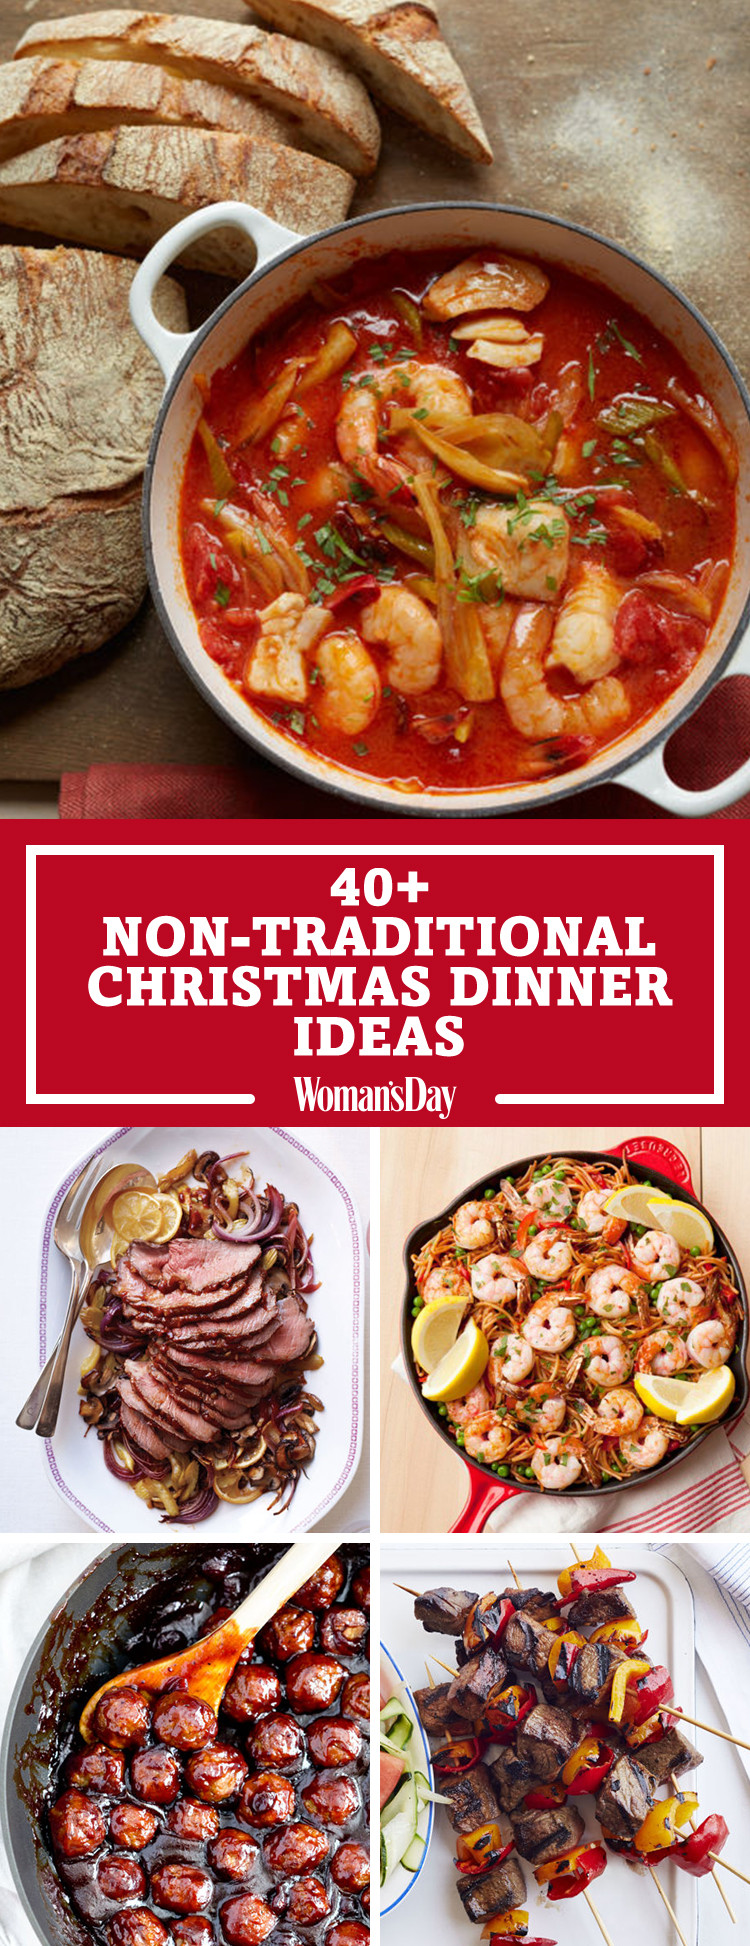 Non Traditional Thanksgiving Dinner Ideas  40 Easy Christmas Dinner Ideas Best Recipes for